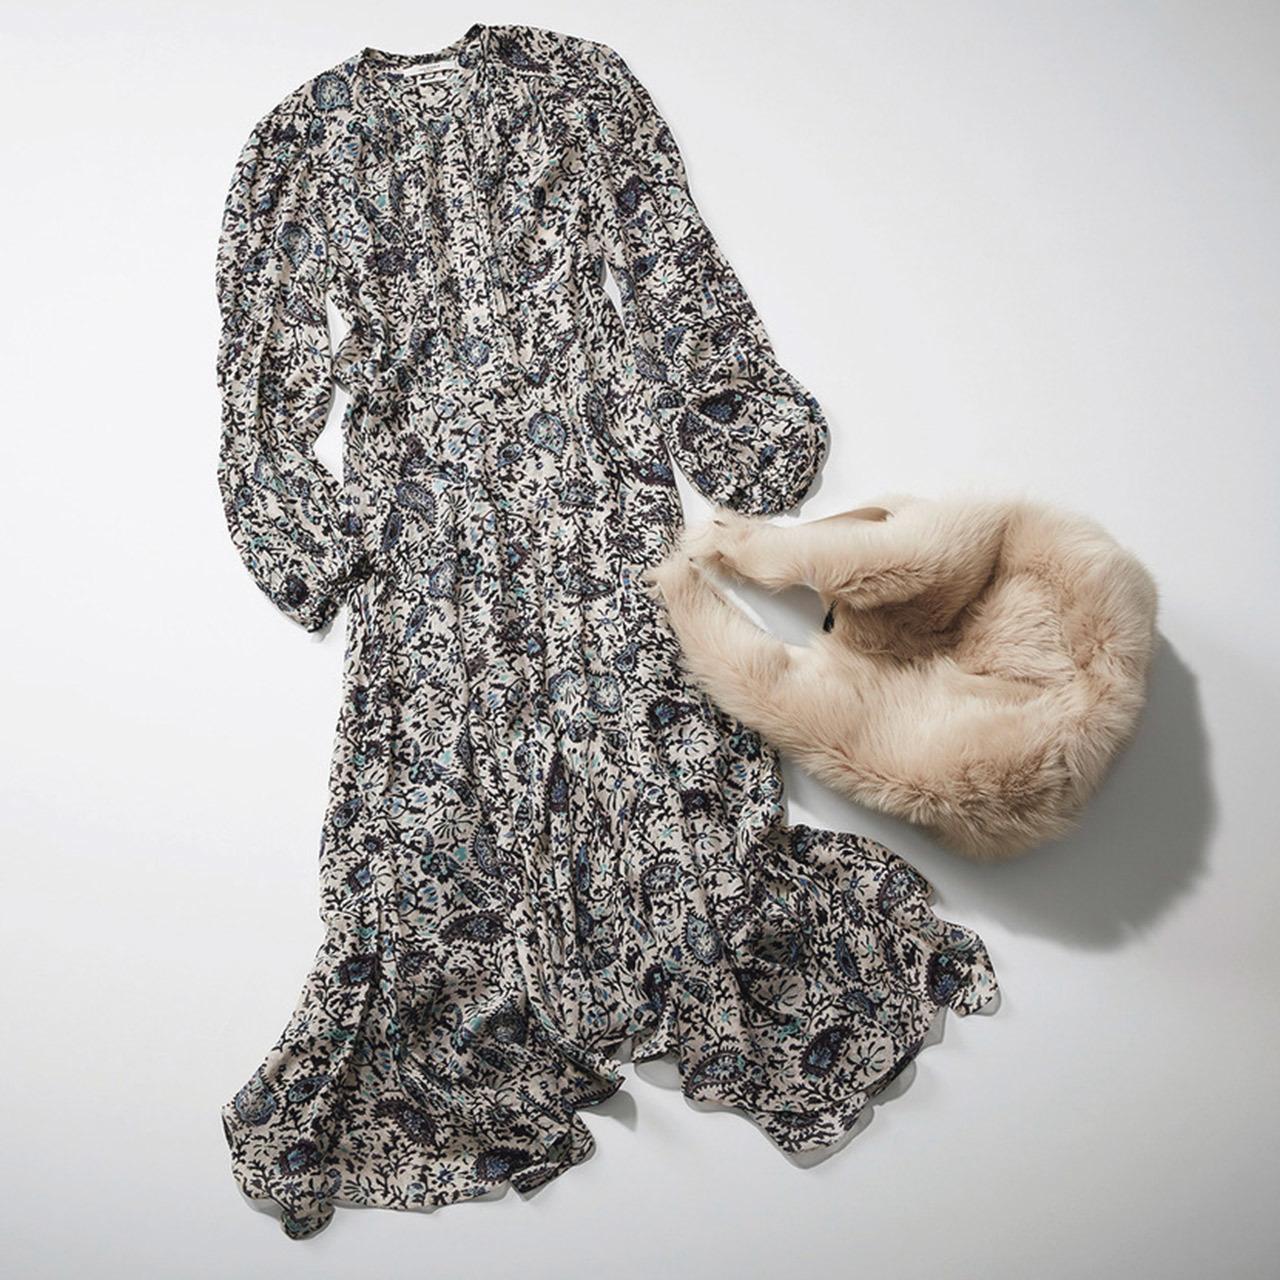 ISABEL MARANT ÉTOILEのプリントワンピースと Anita Bilardiのファーバッグ